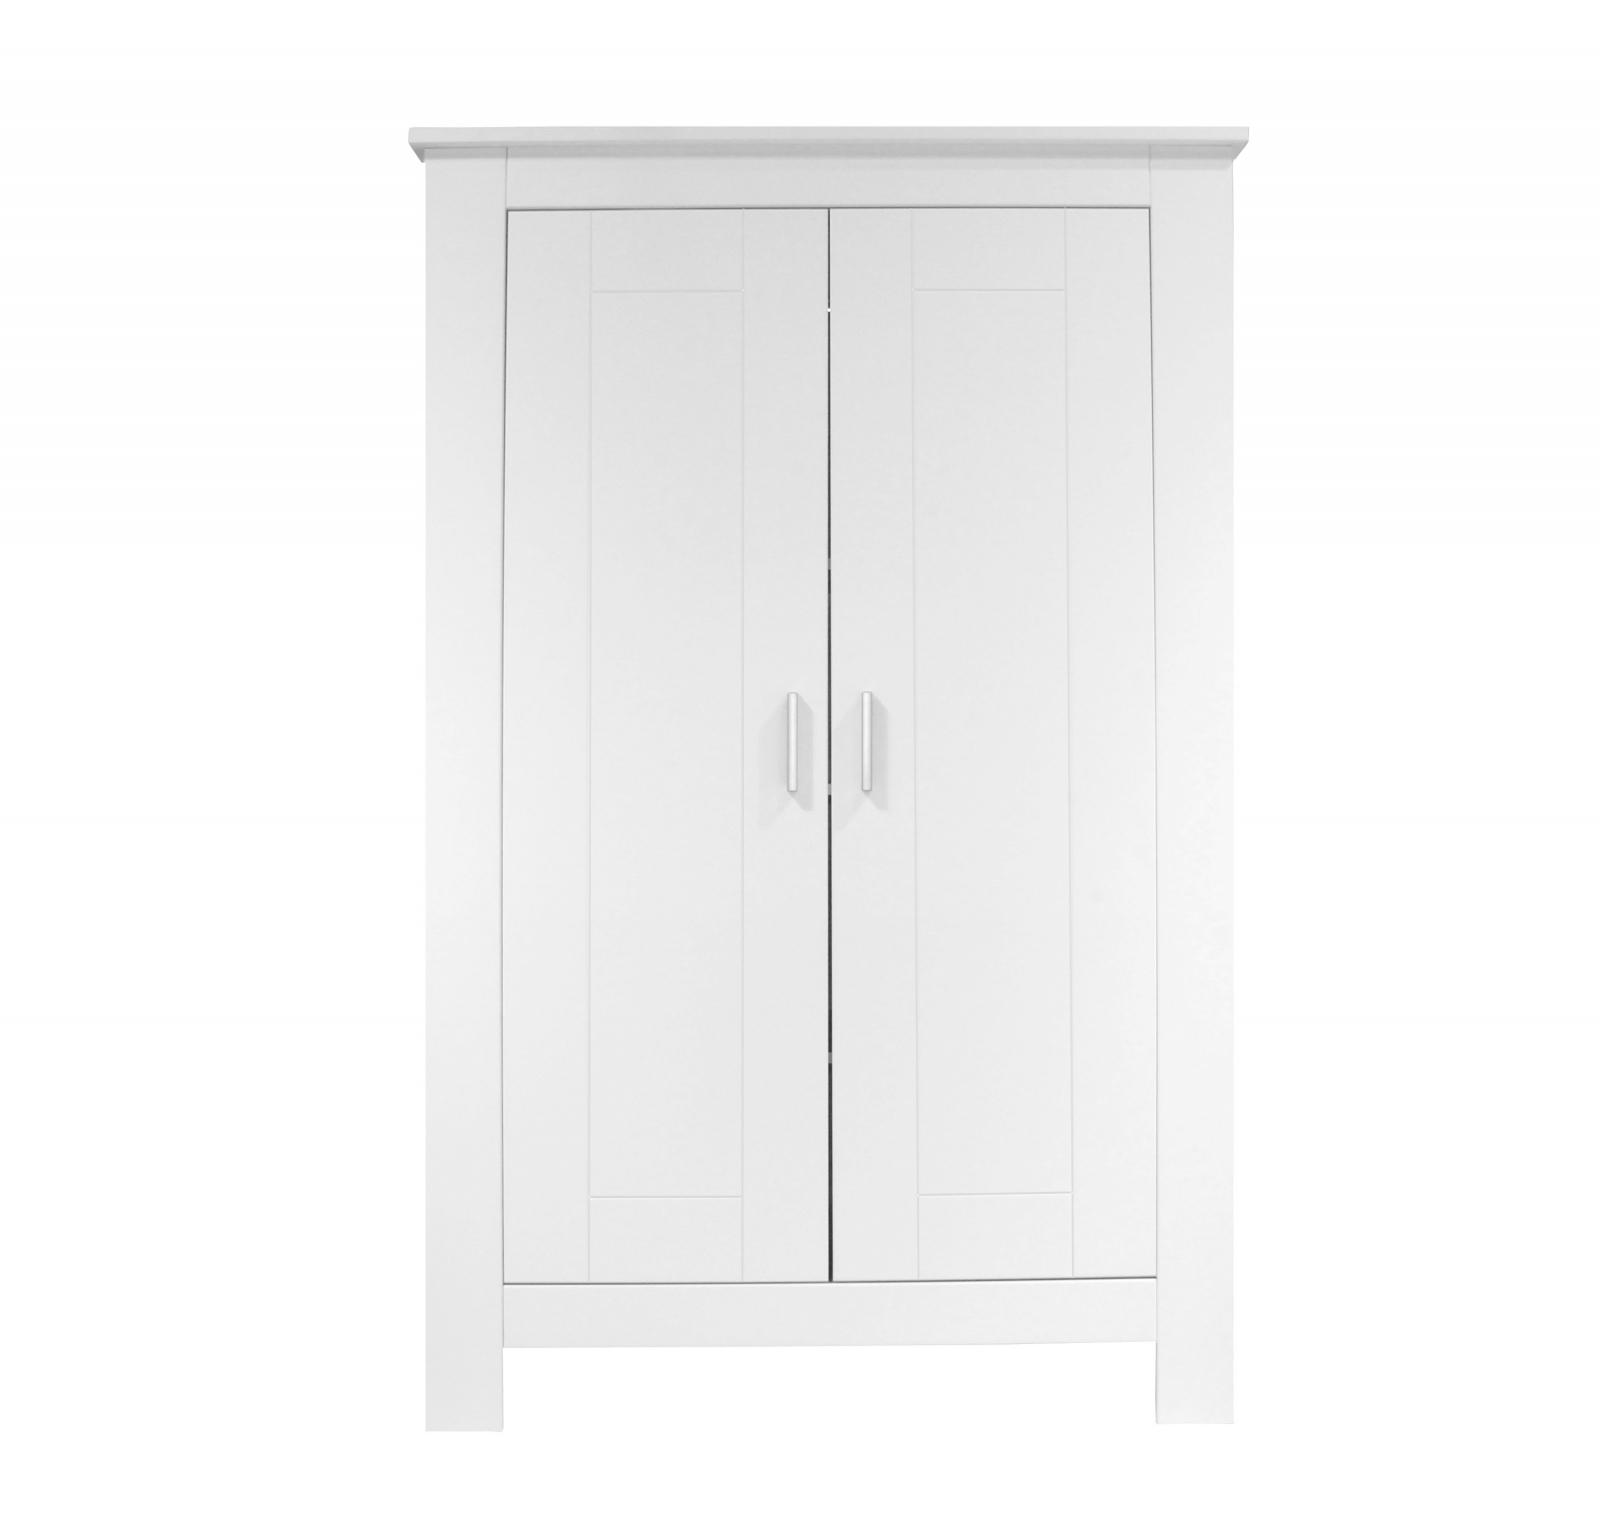 Bopita Cobi 2-Doors Wardrobe